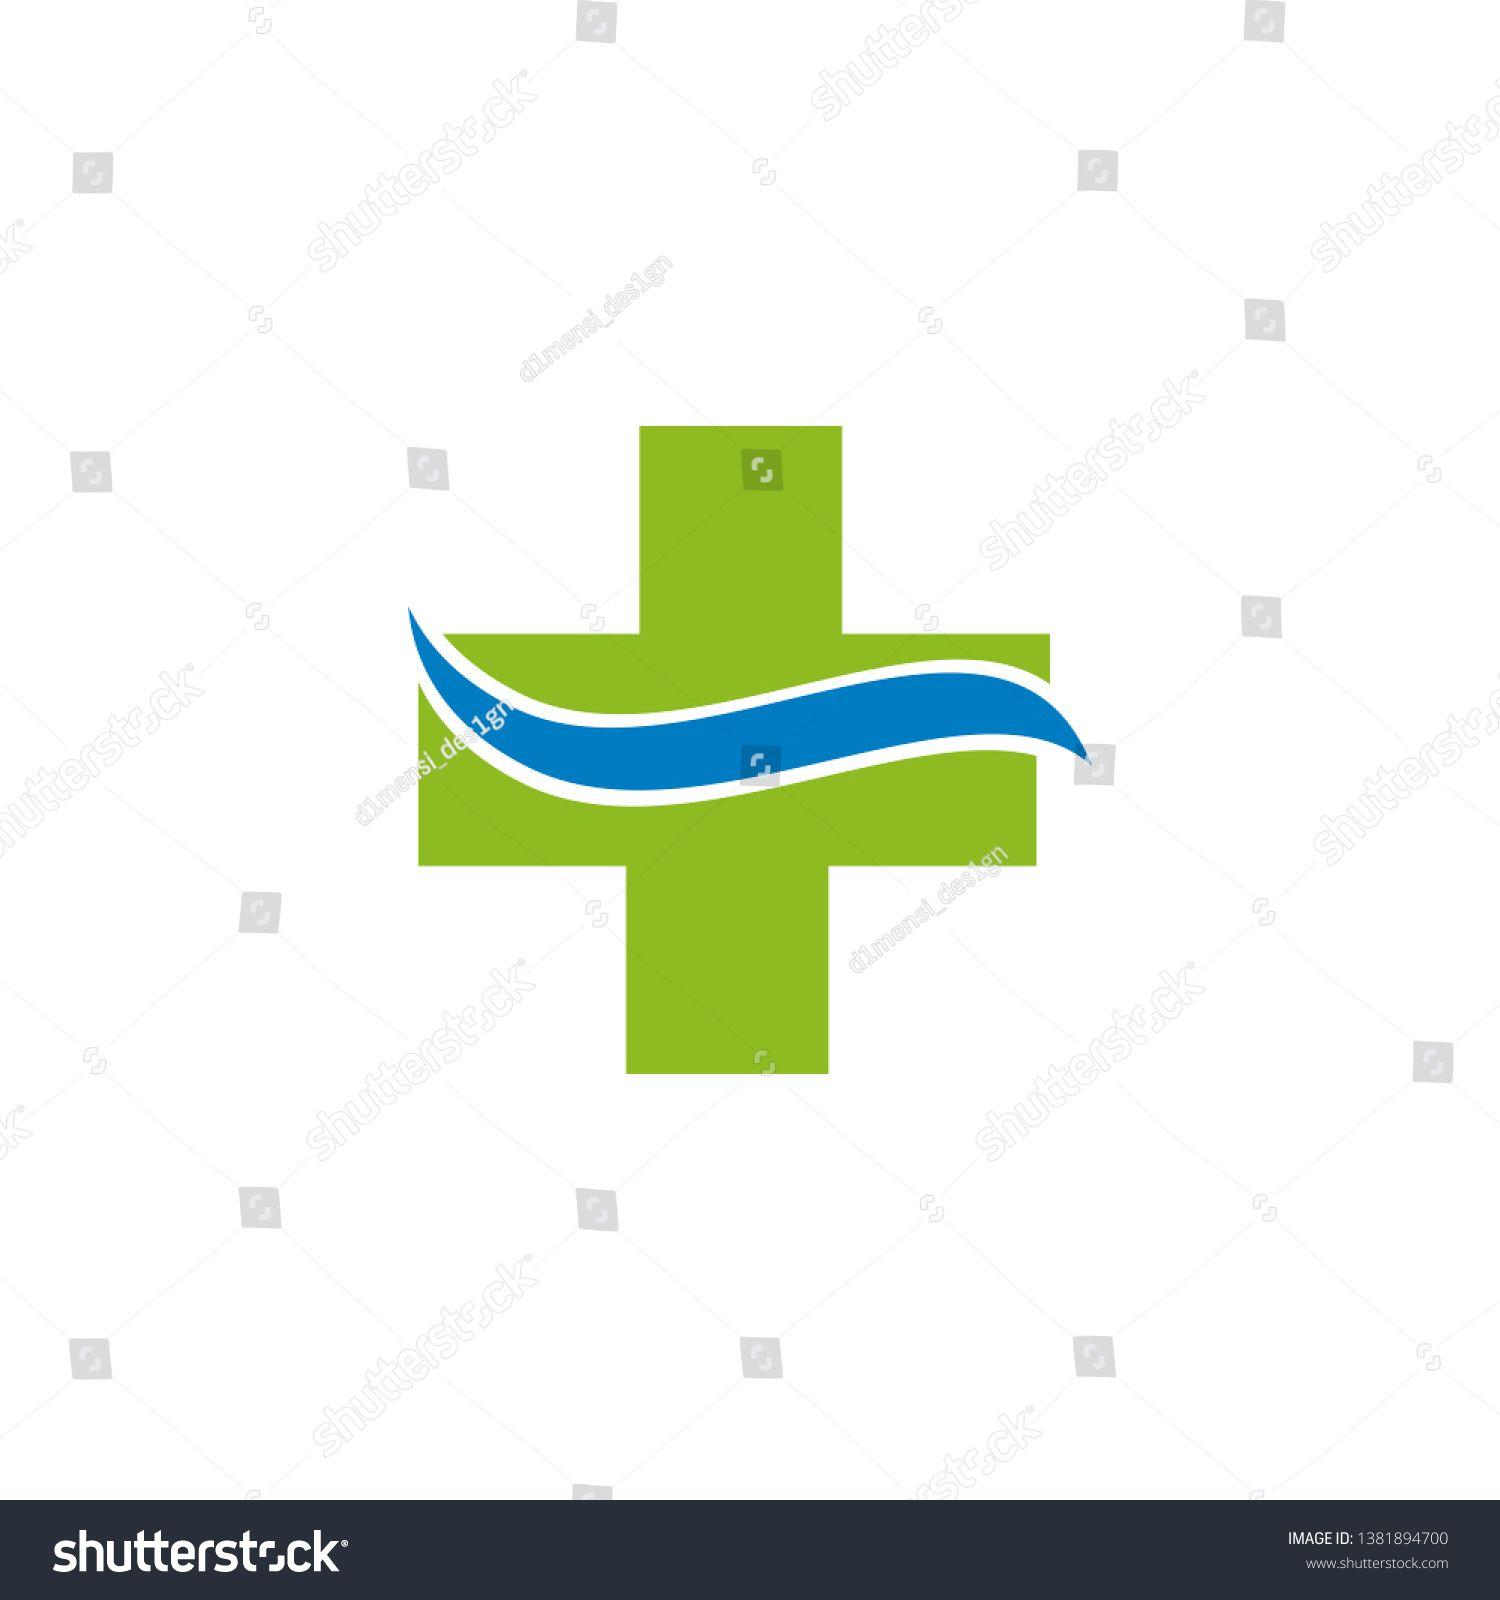 Home health care organization